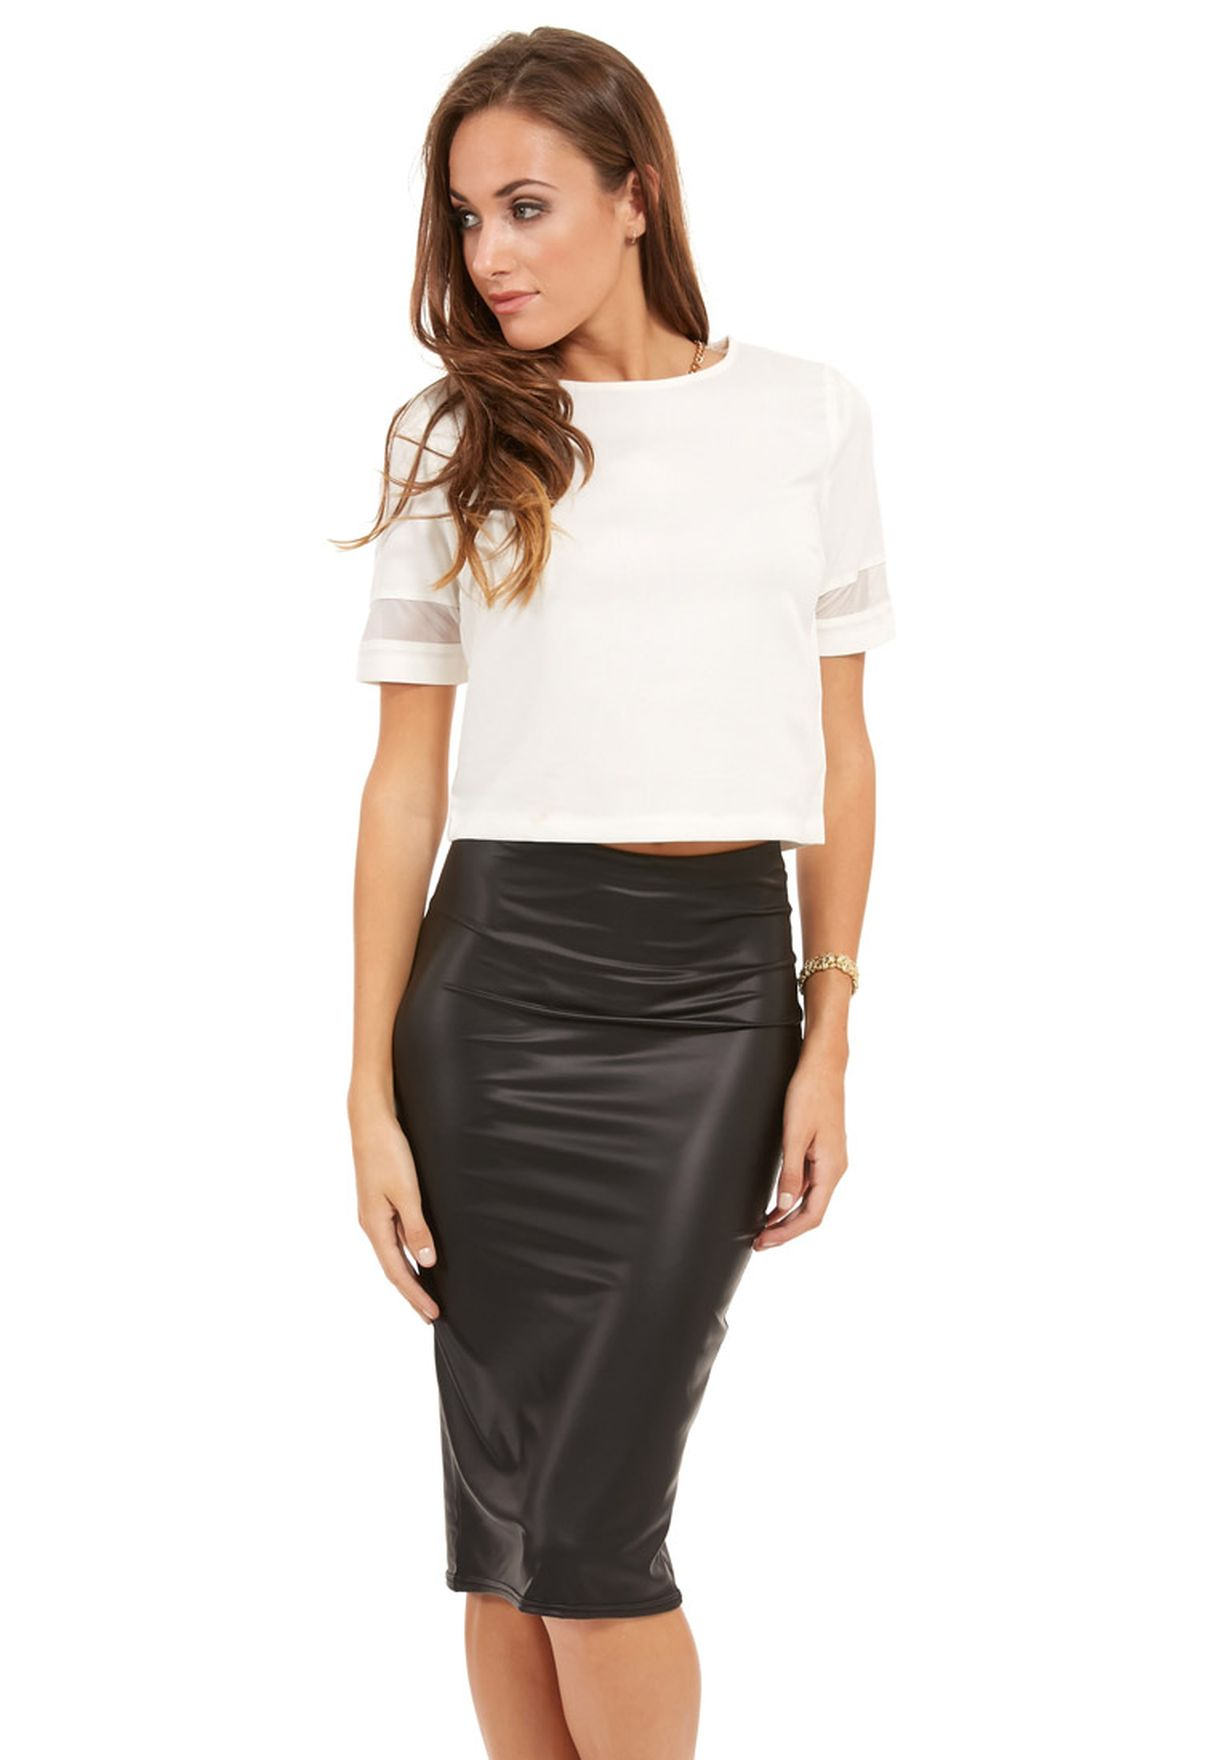 51b9e3bb7d2 Shop Ax paris white Mesh Insert Sleeve Top for Women in Saudi ...